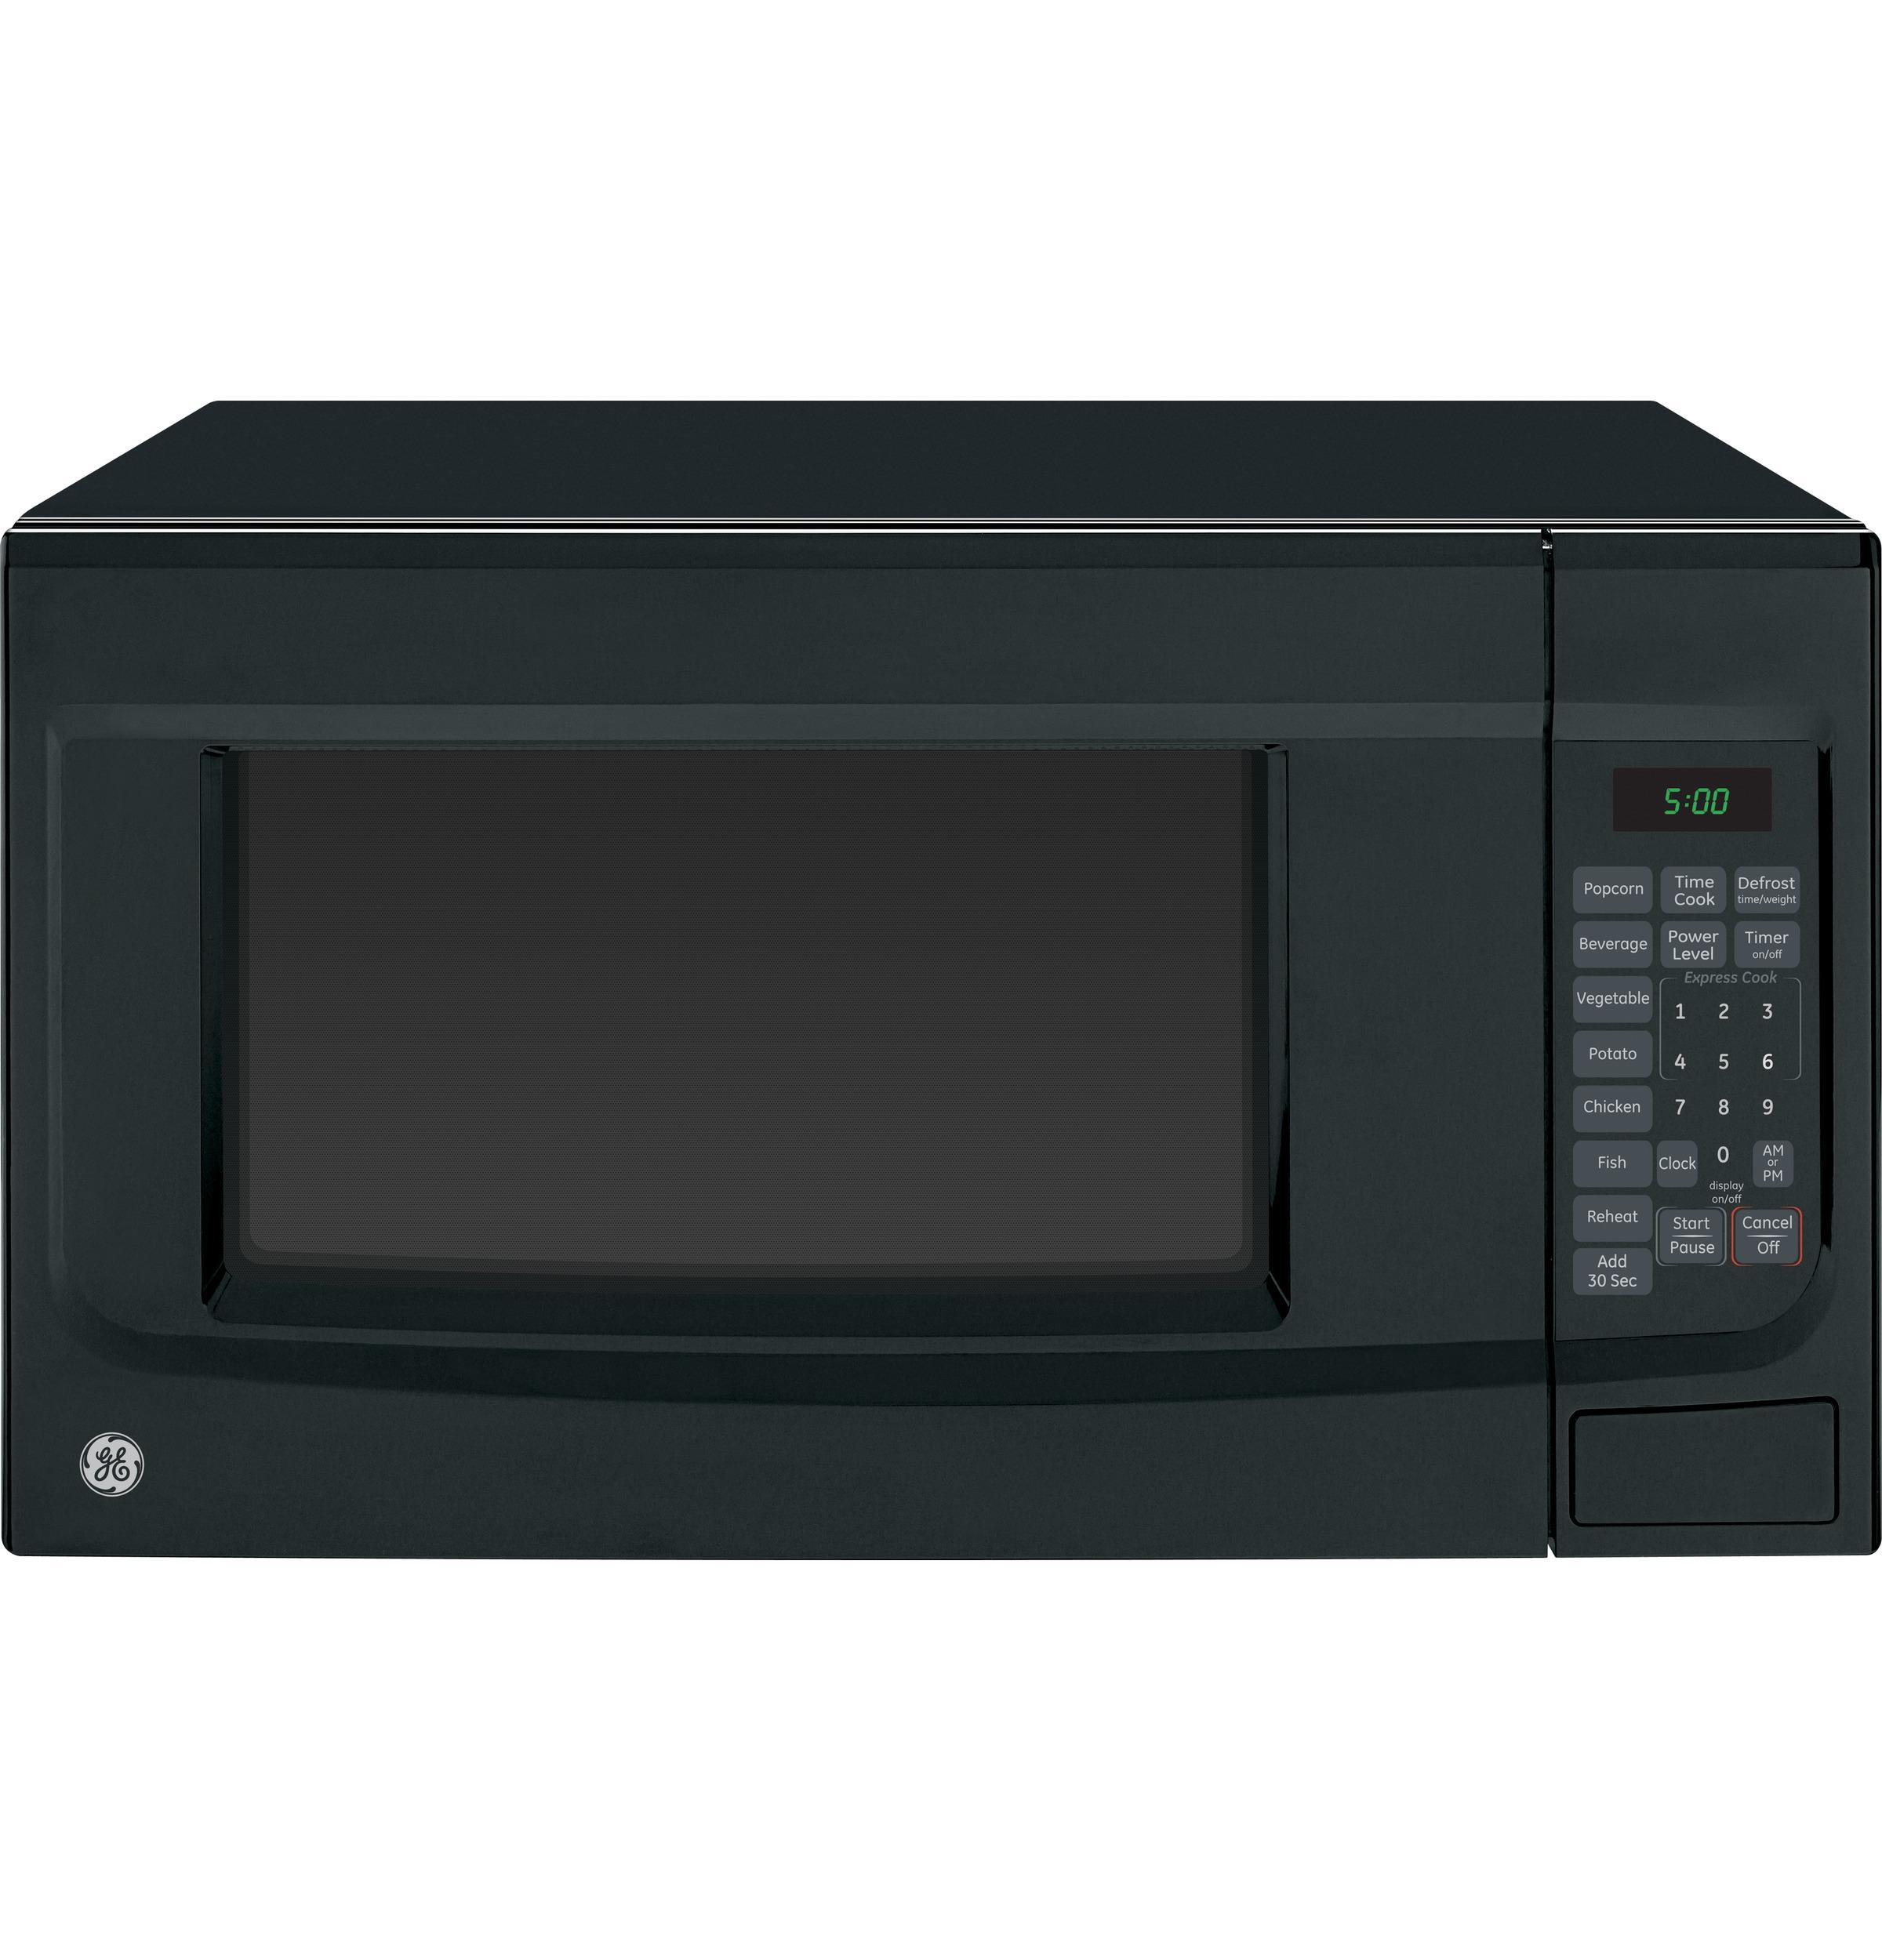 Model: JES1460DSBB | GE GE® 1.4 Cu. Ft. Countertop Microwave Oven